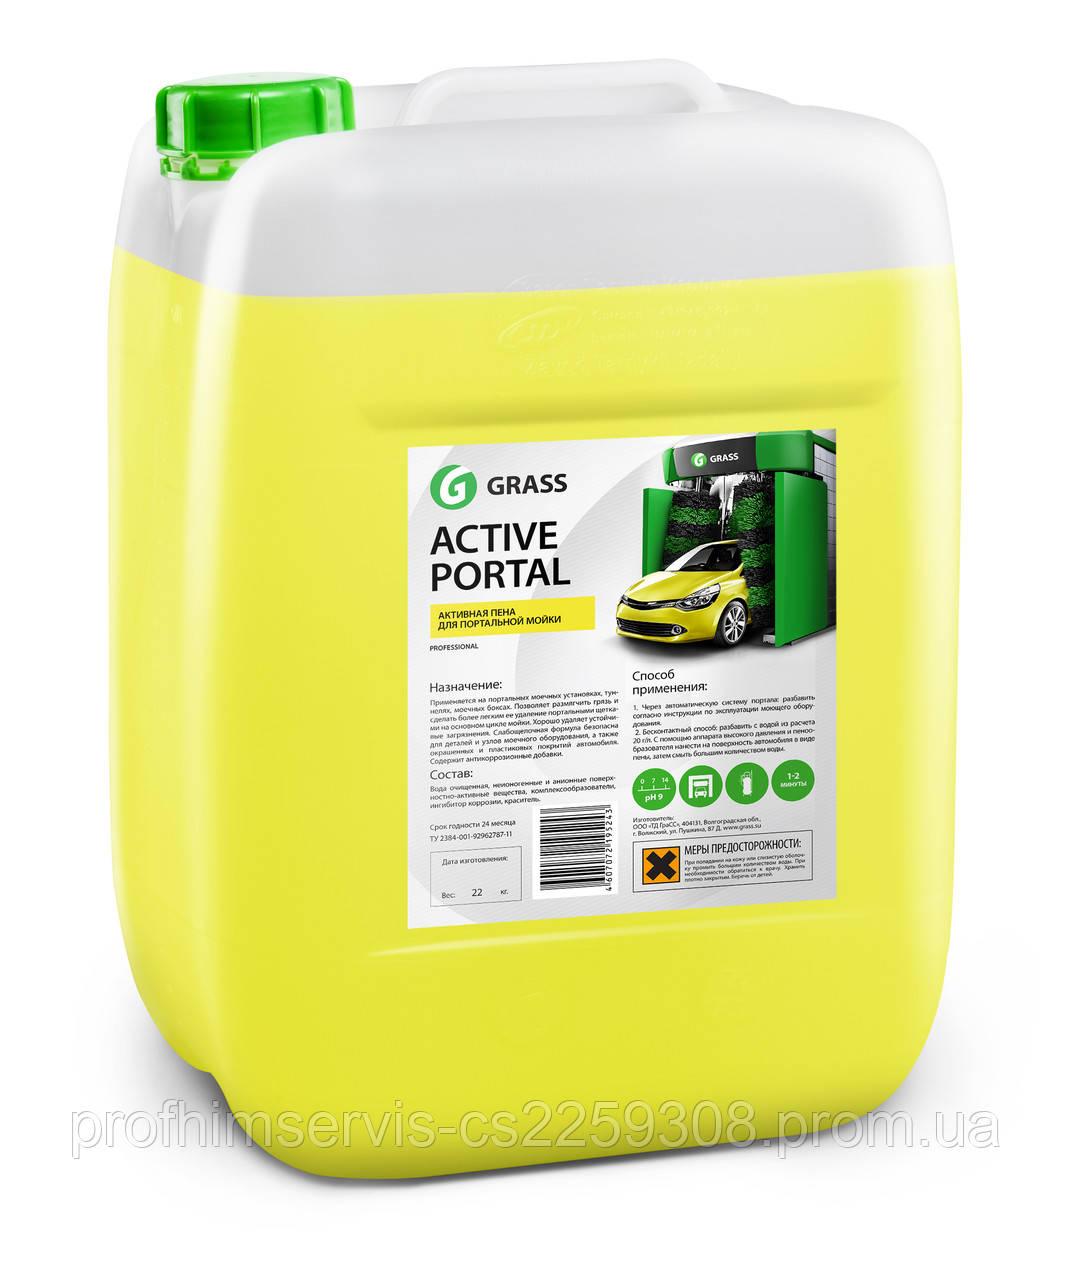 GRASS Активная пена «Active Portal» 20 KG.